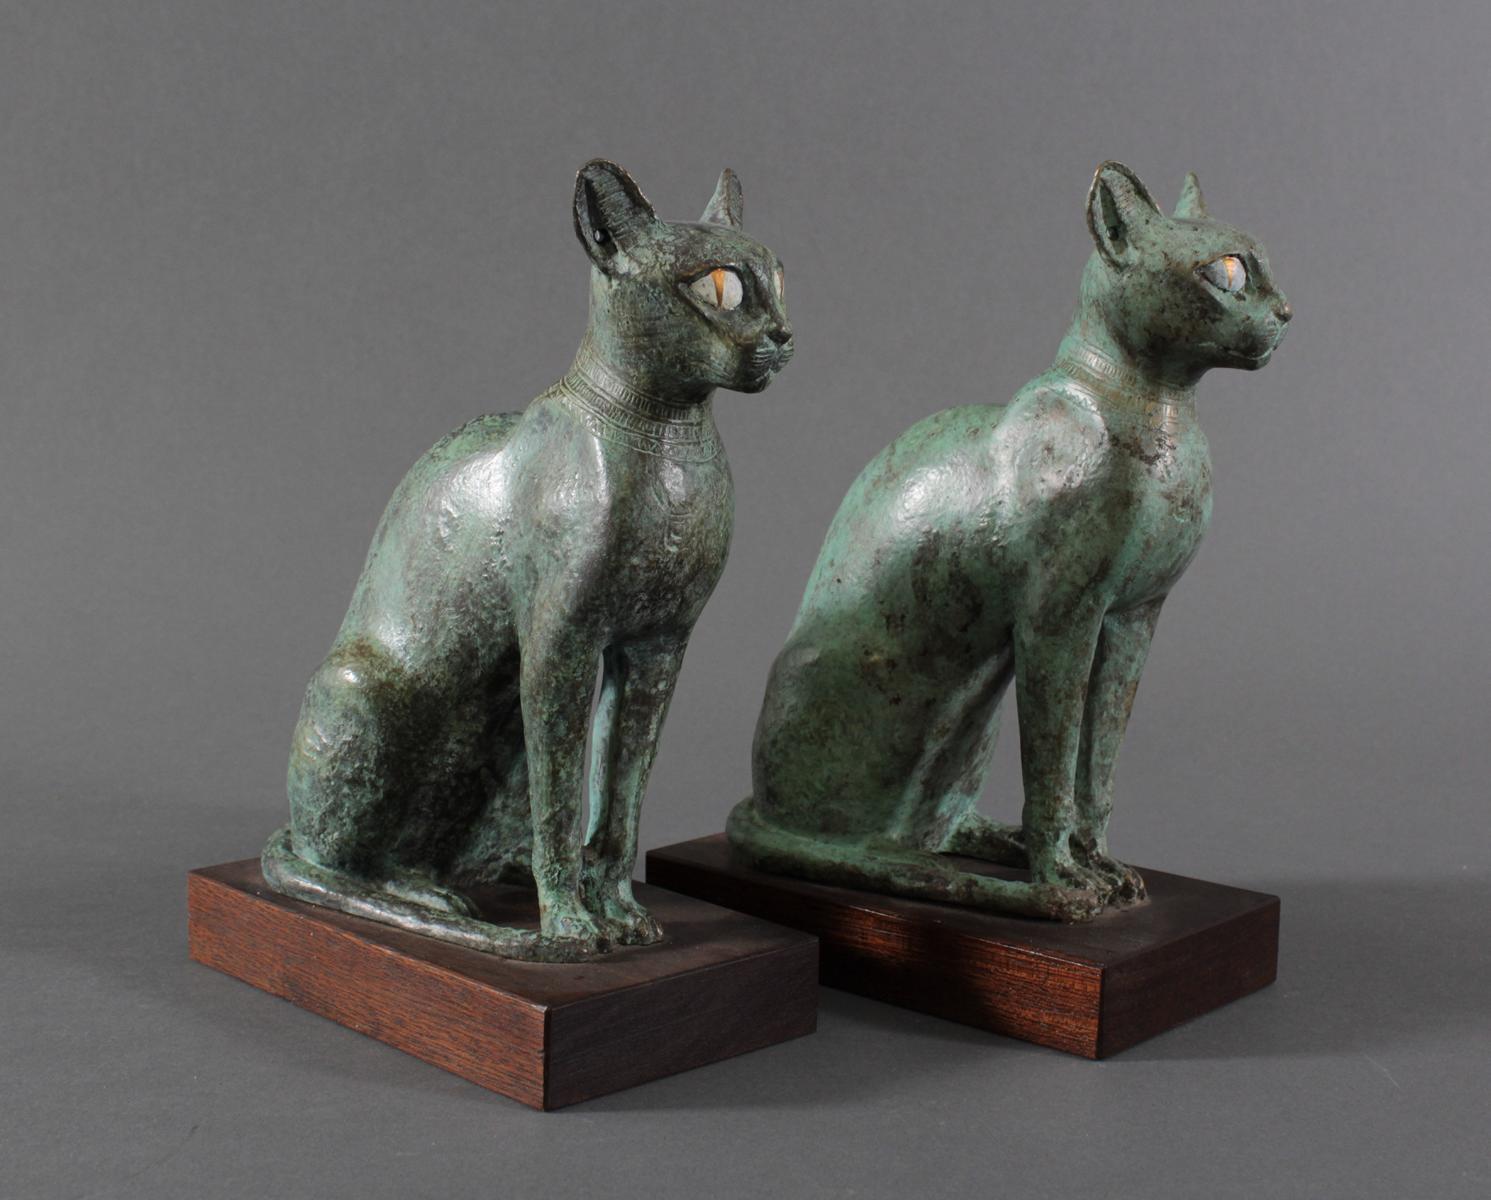 Paar Katzenfiguren aus Bronze,der Göttin Bastet Lieblingstier, Votivfiguren-2